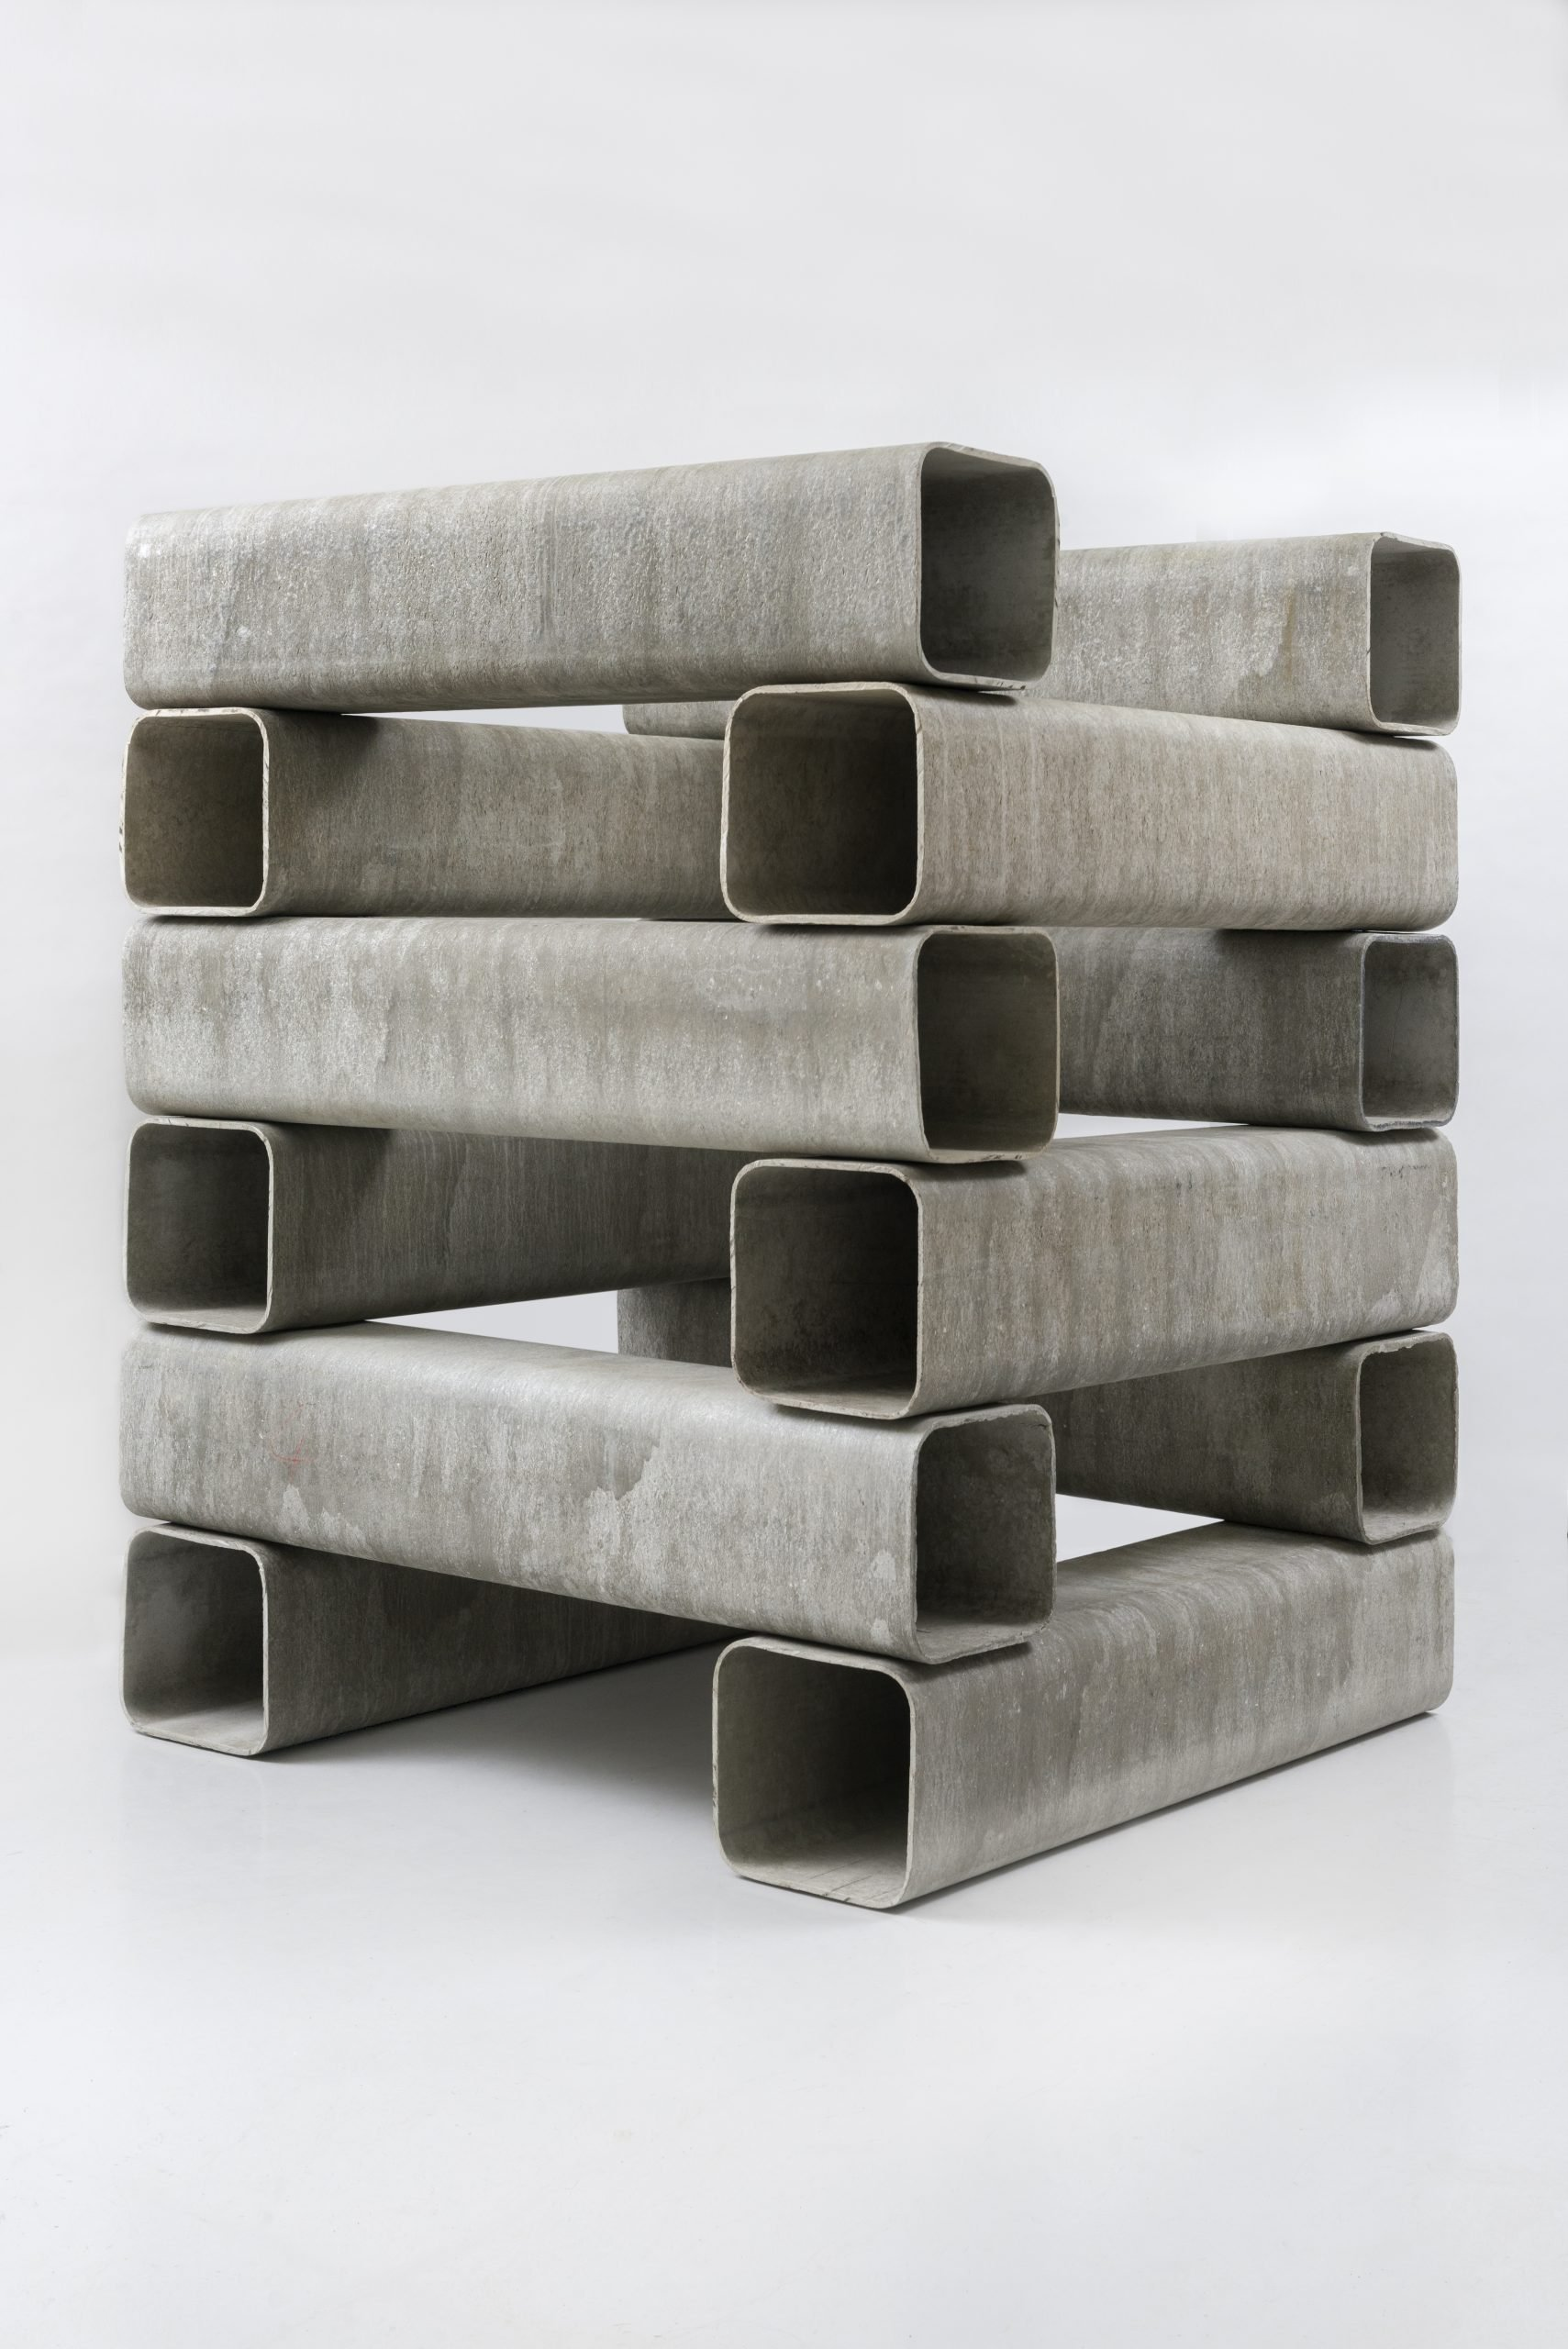 Alighero Boetti, Catasta, 1992 (1967), 12 elementi in Eternit, 187x150x150 cm